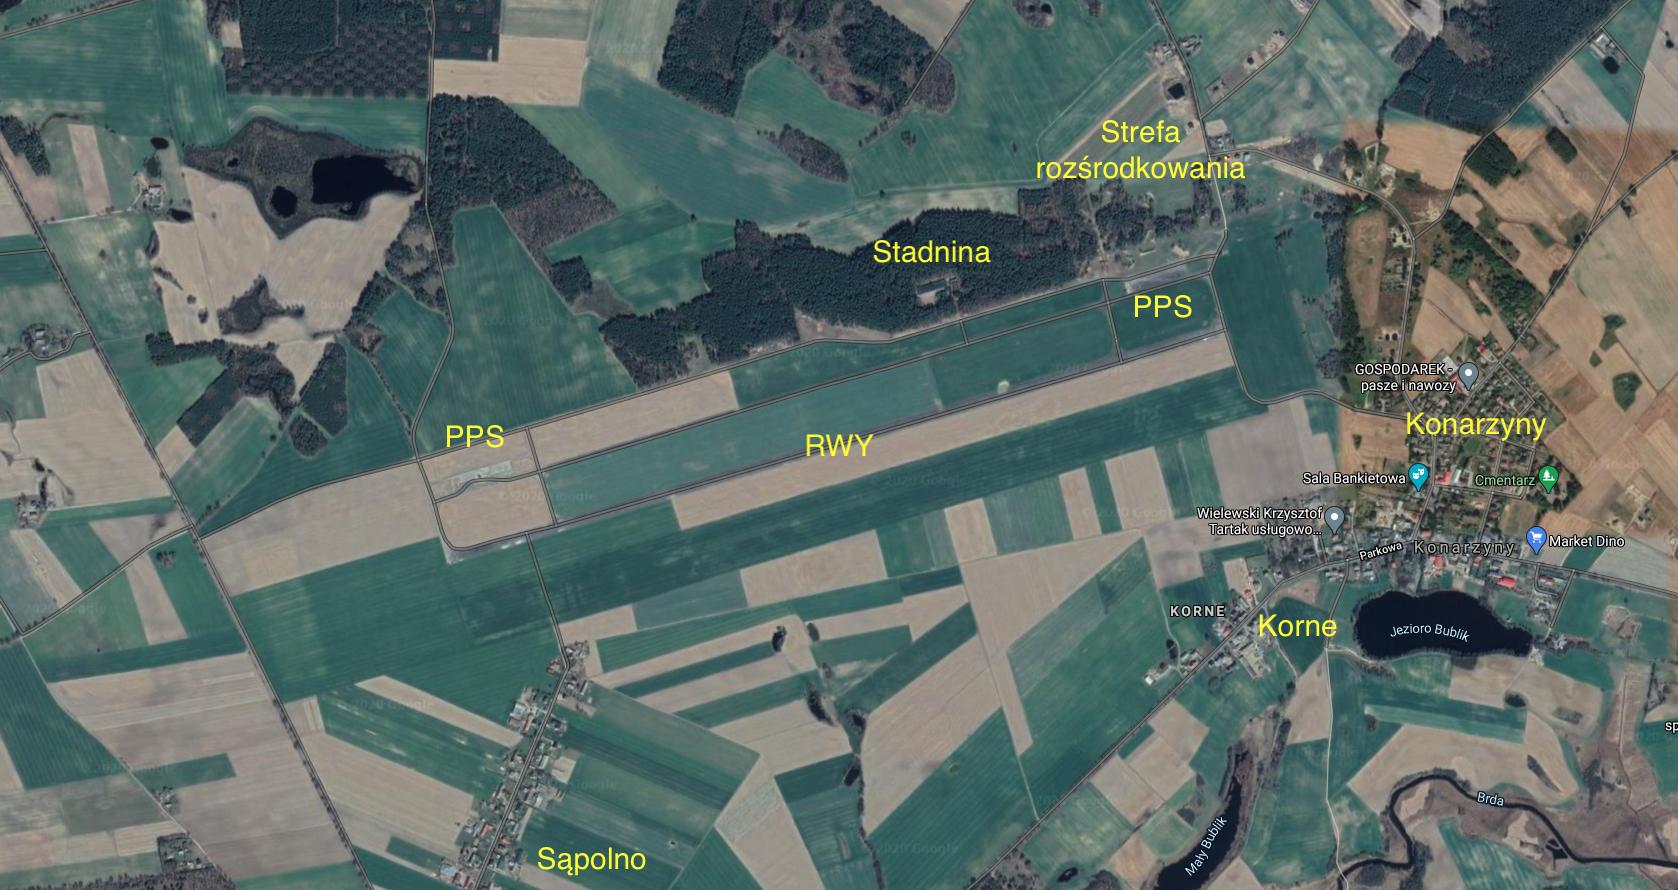 Lotnisko Konarzyny. 2021 rok. Praca Karol Placha Hetman